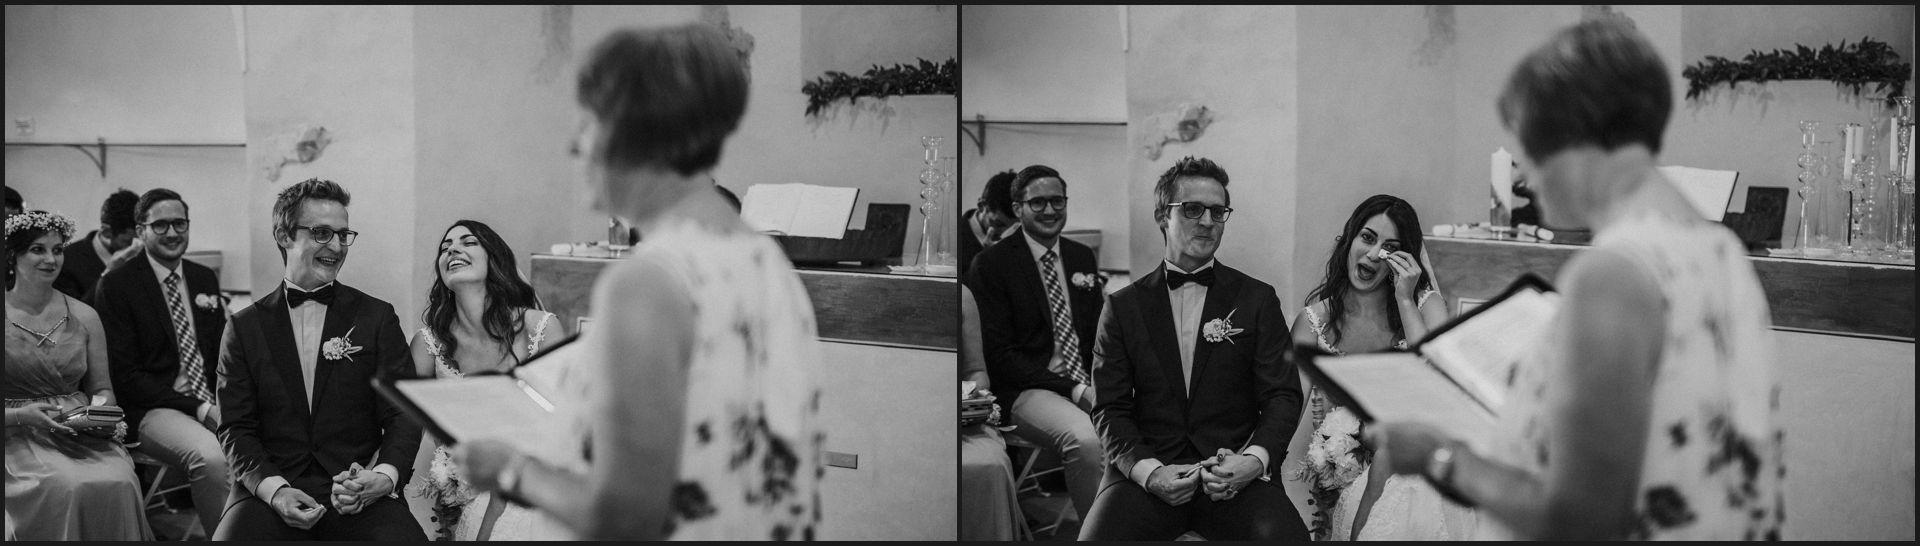 black and white, wedding, umbria,nikis resort, bride, groom, cry